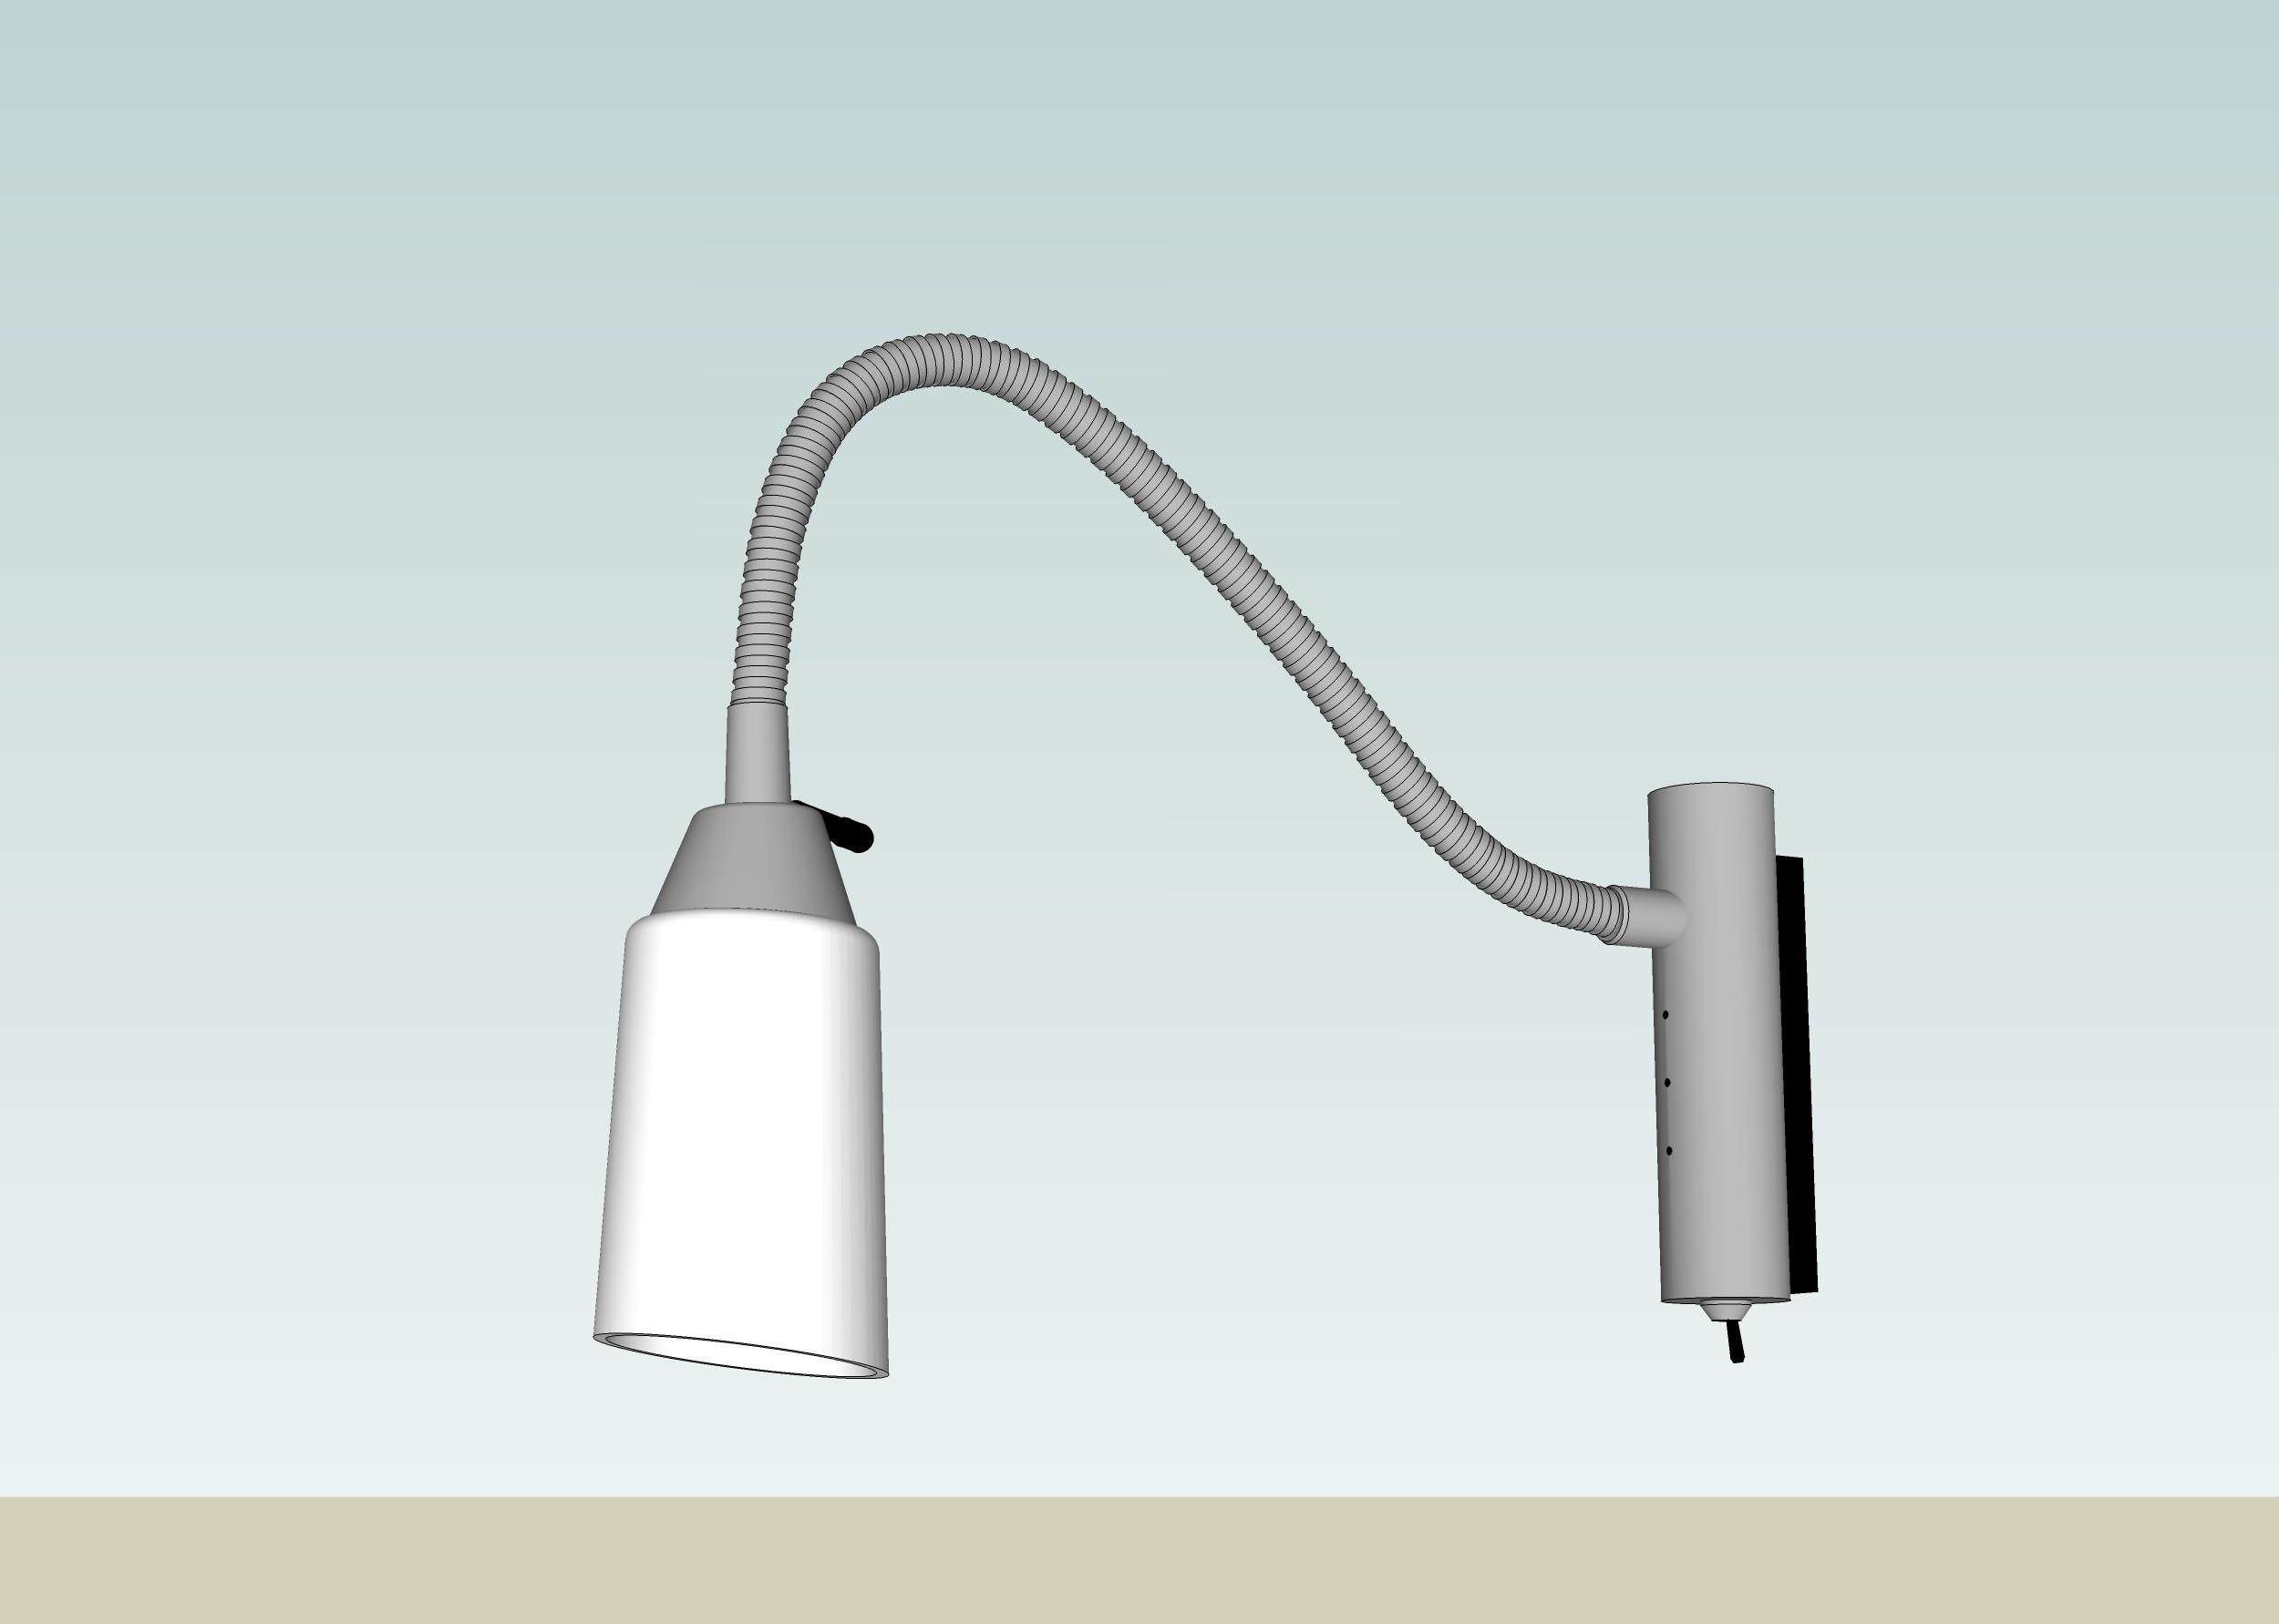 reading wall lamp 3d model skp 3. reading wall lamp 3D model   CGTrader